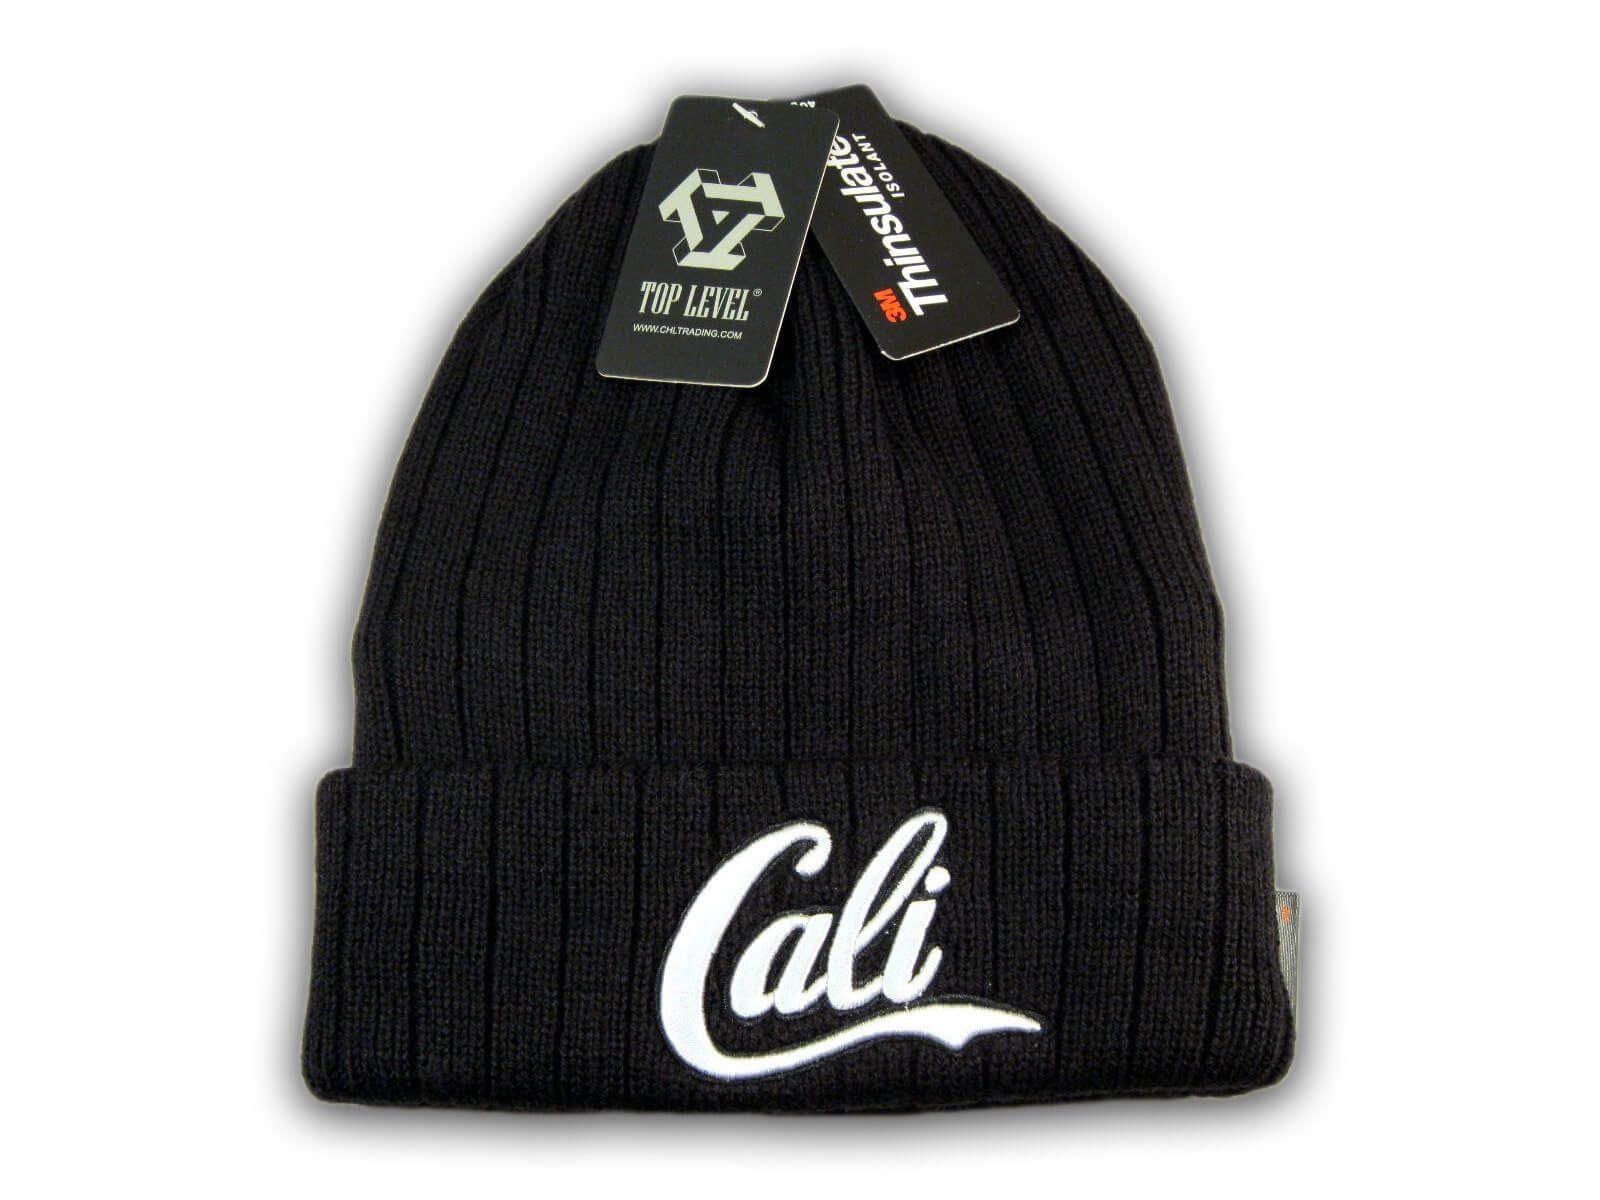 California hat CALI Beanie knit hat Cuffed Skull cap 3M THINSULATE Black//Gray